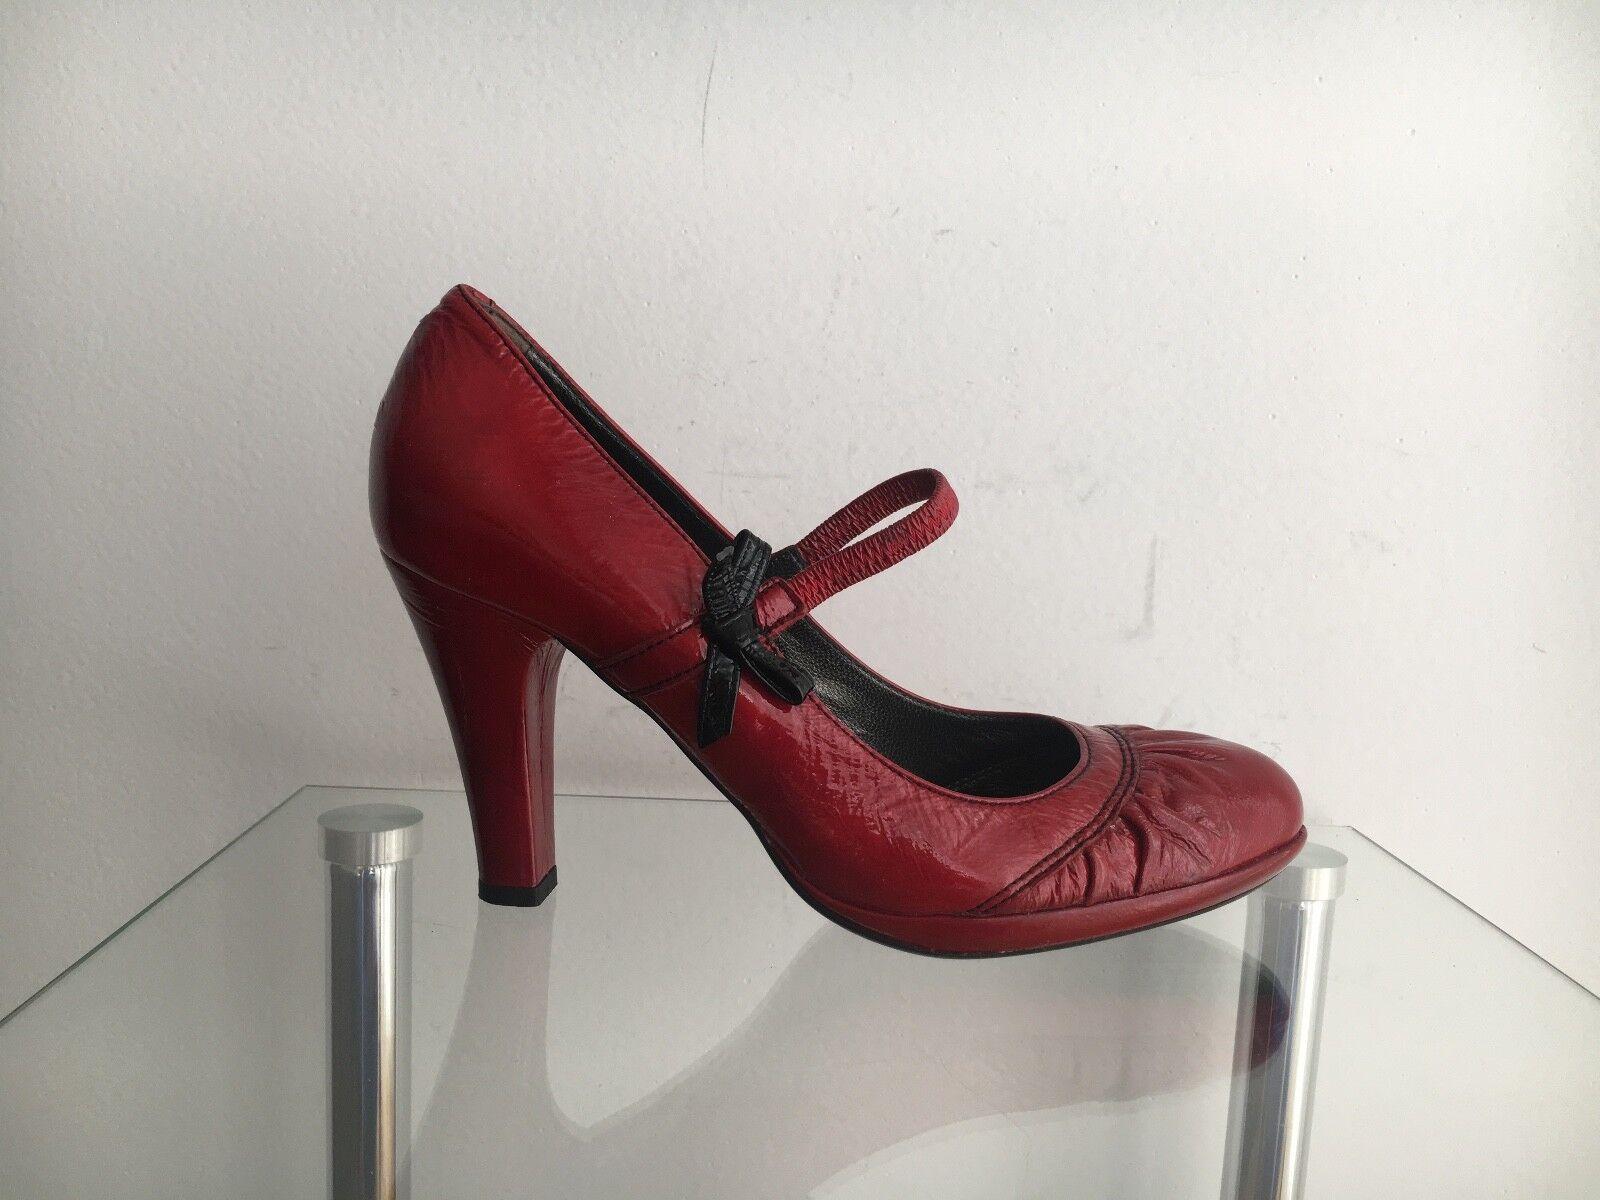 VIC Heels MATIE Pumps High Heels VIC Rot ROT Grösse: 38 aed7e0